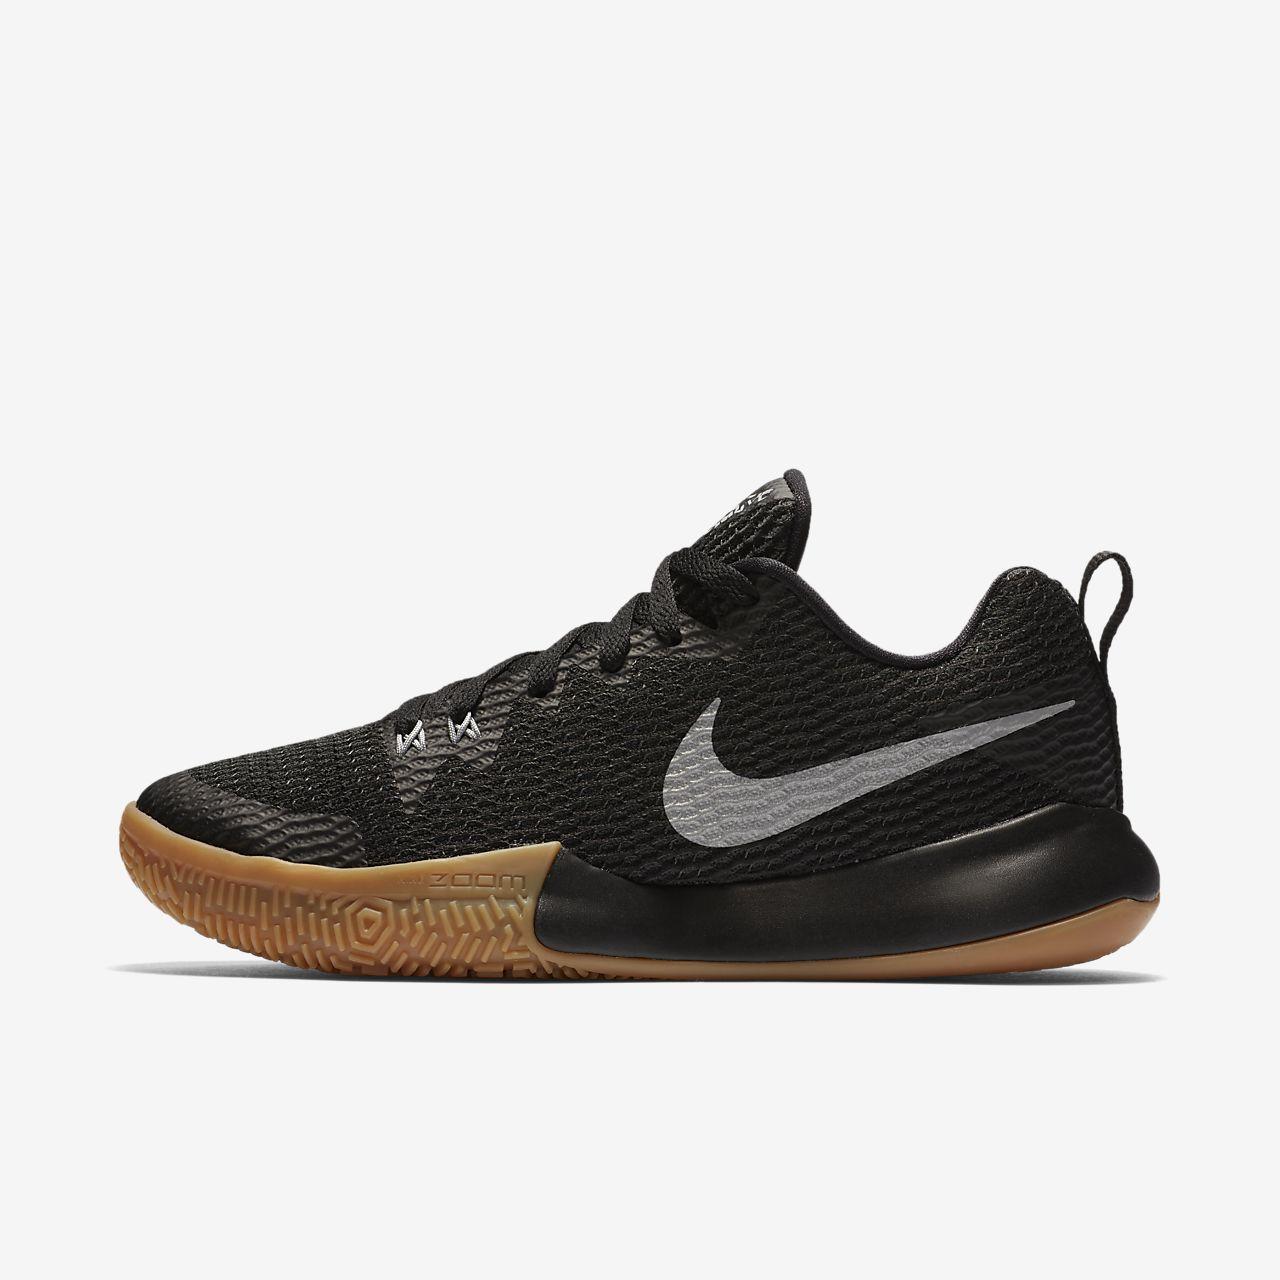 Nike Zoom Live II, Scarpe da Basket Donna, Nero (Black/Reflect Silver-Anthracite 001), 37.5 EU